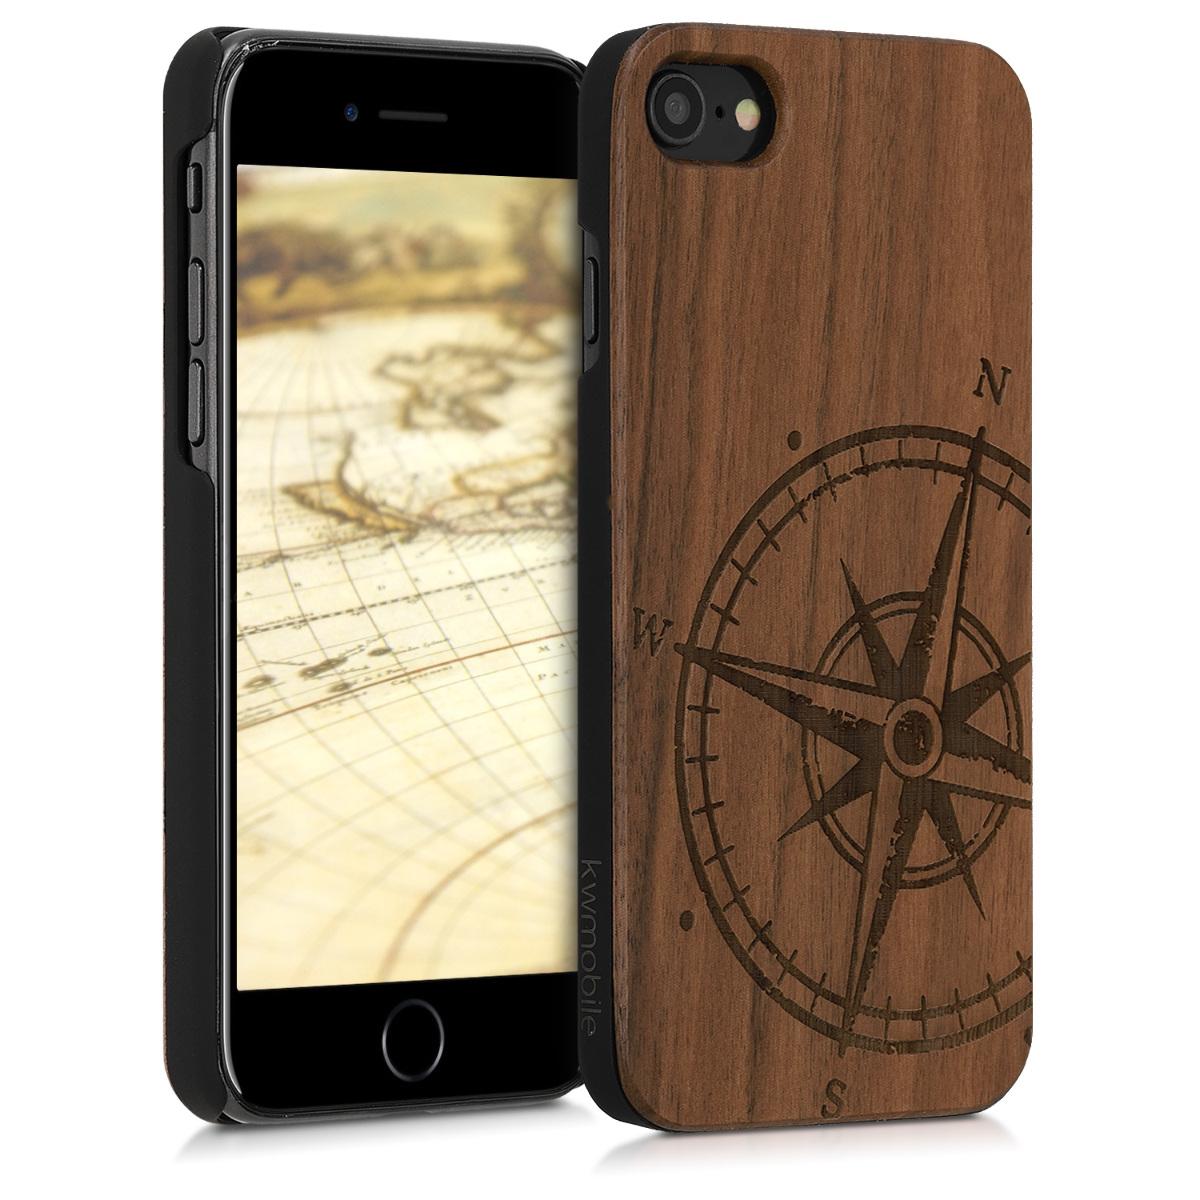 KW Ξύλινη Θήκη iPhone 7 / 8 - Brown (839462.15)